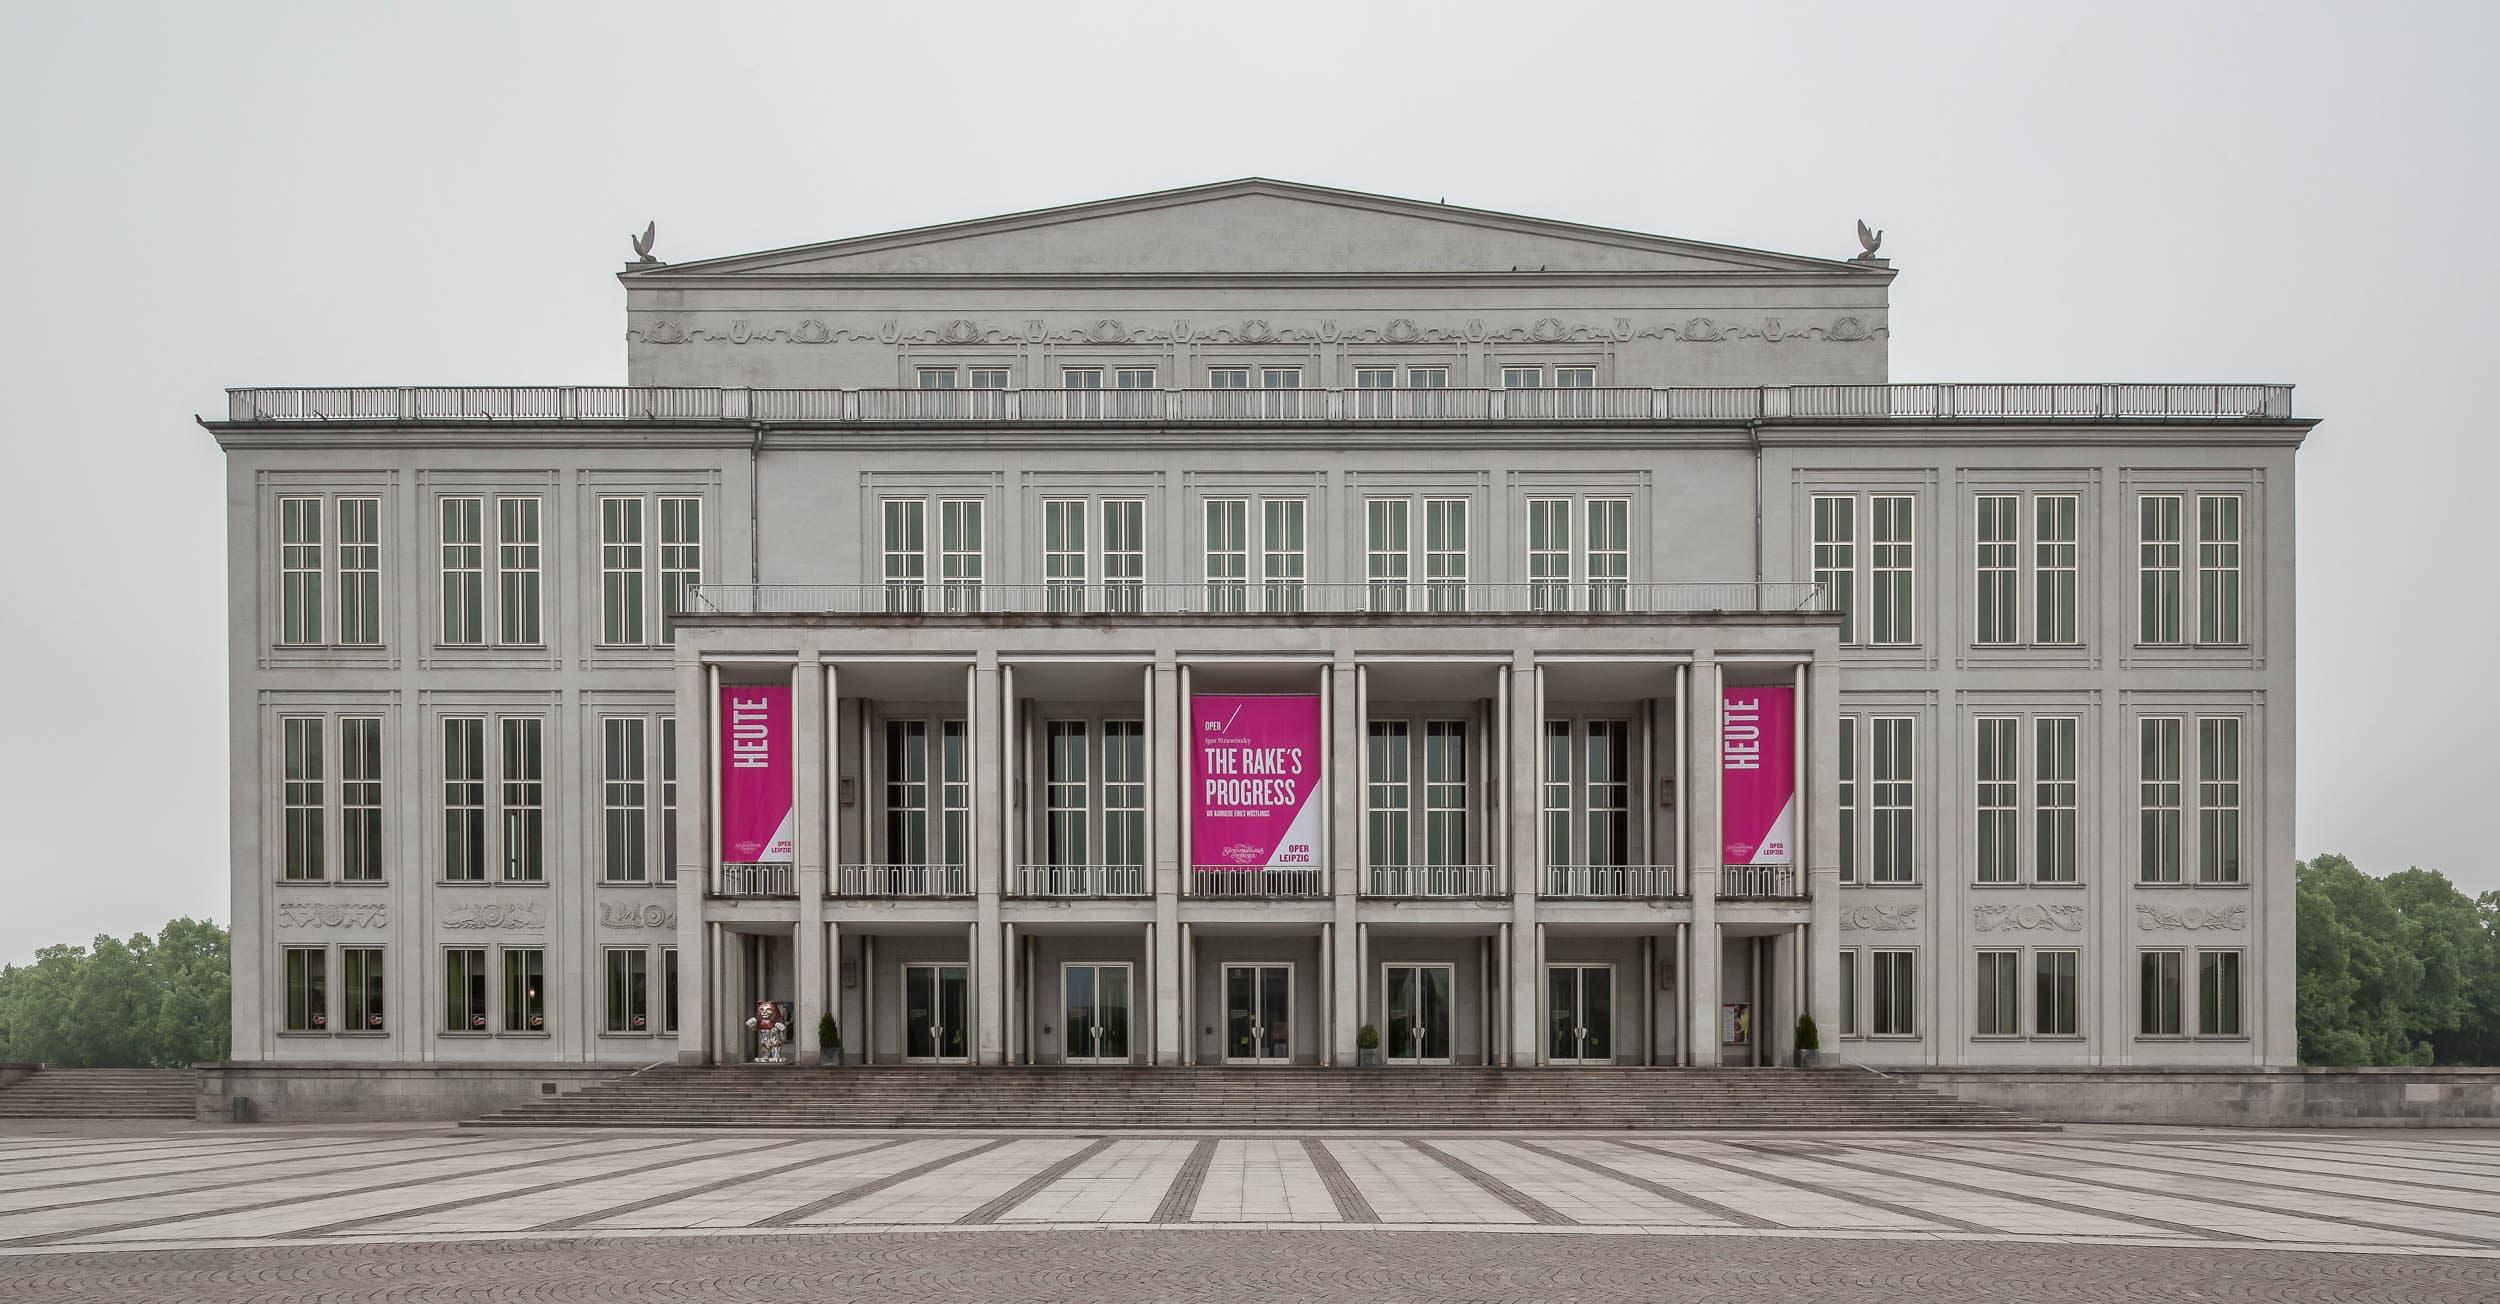 Regentaucher Architekturfotografie | Oper Leipzig